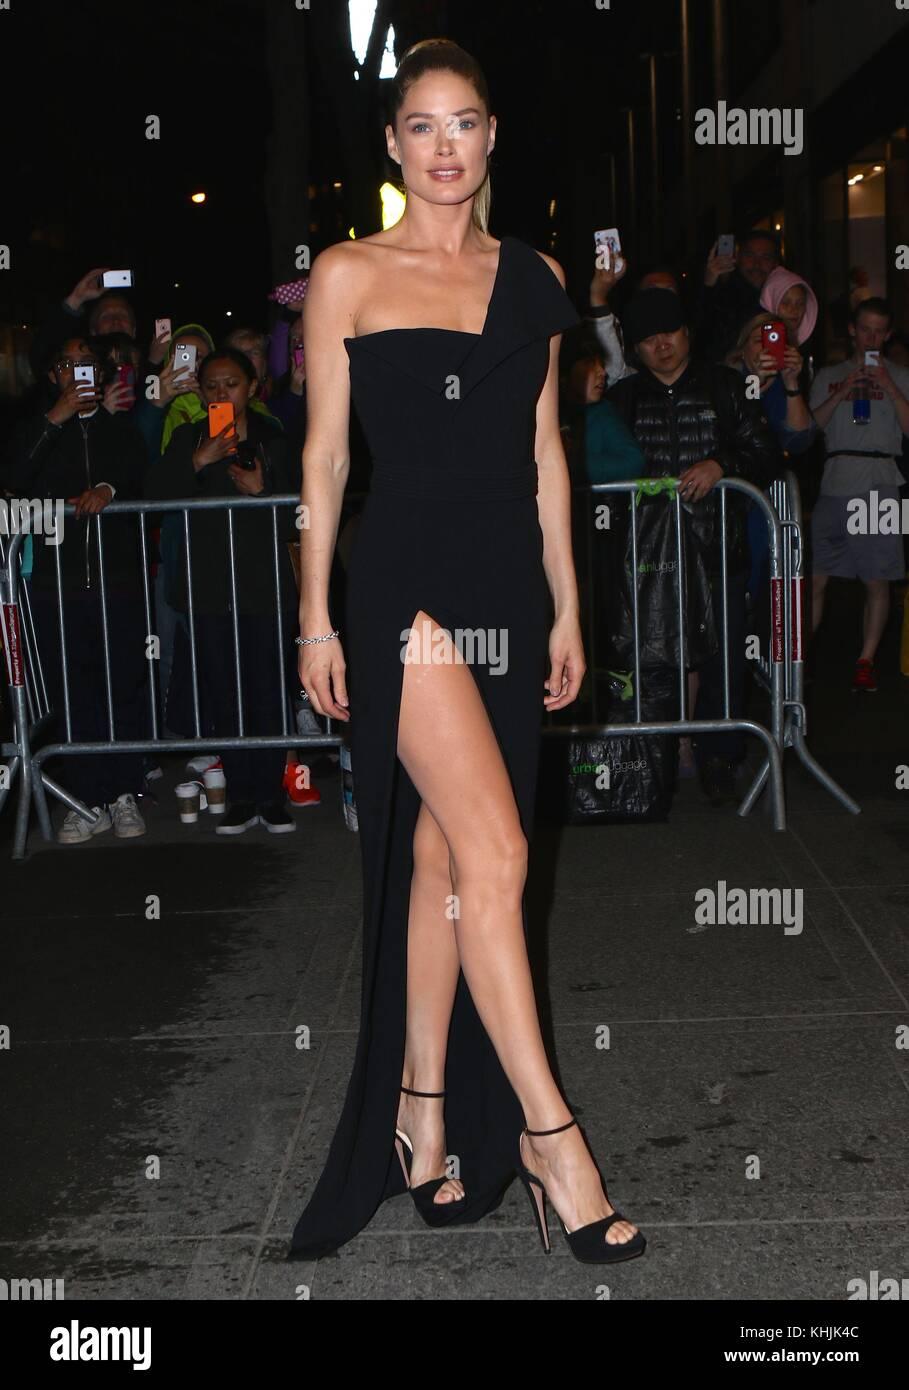 Celebrites Lana Parrilla naked (25 photos), Selfie